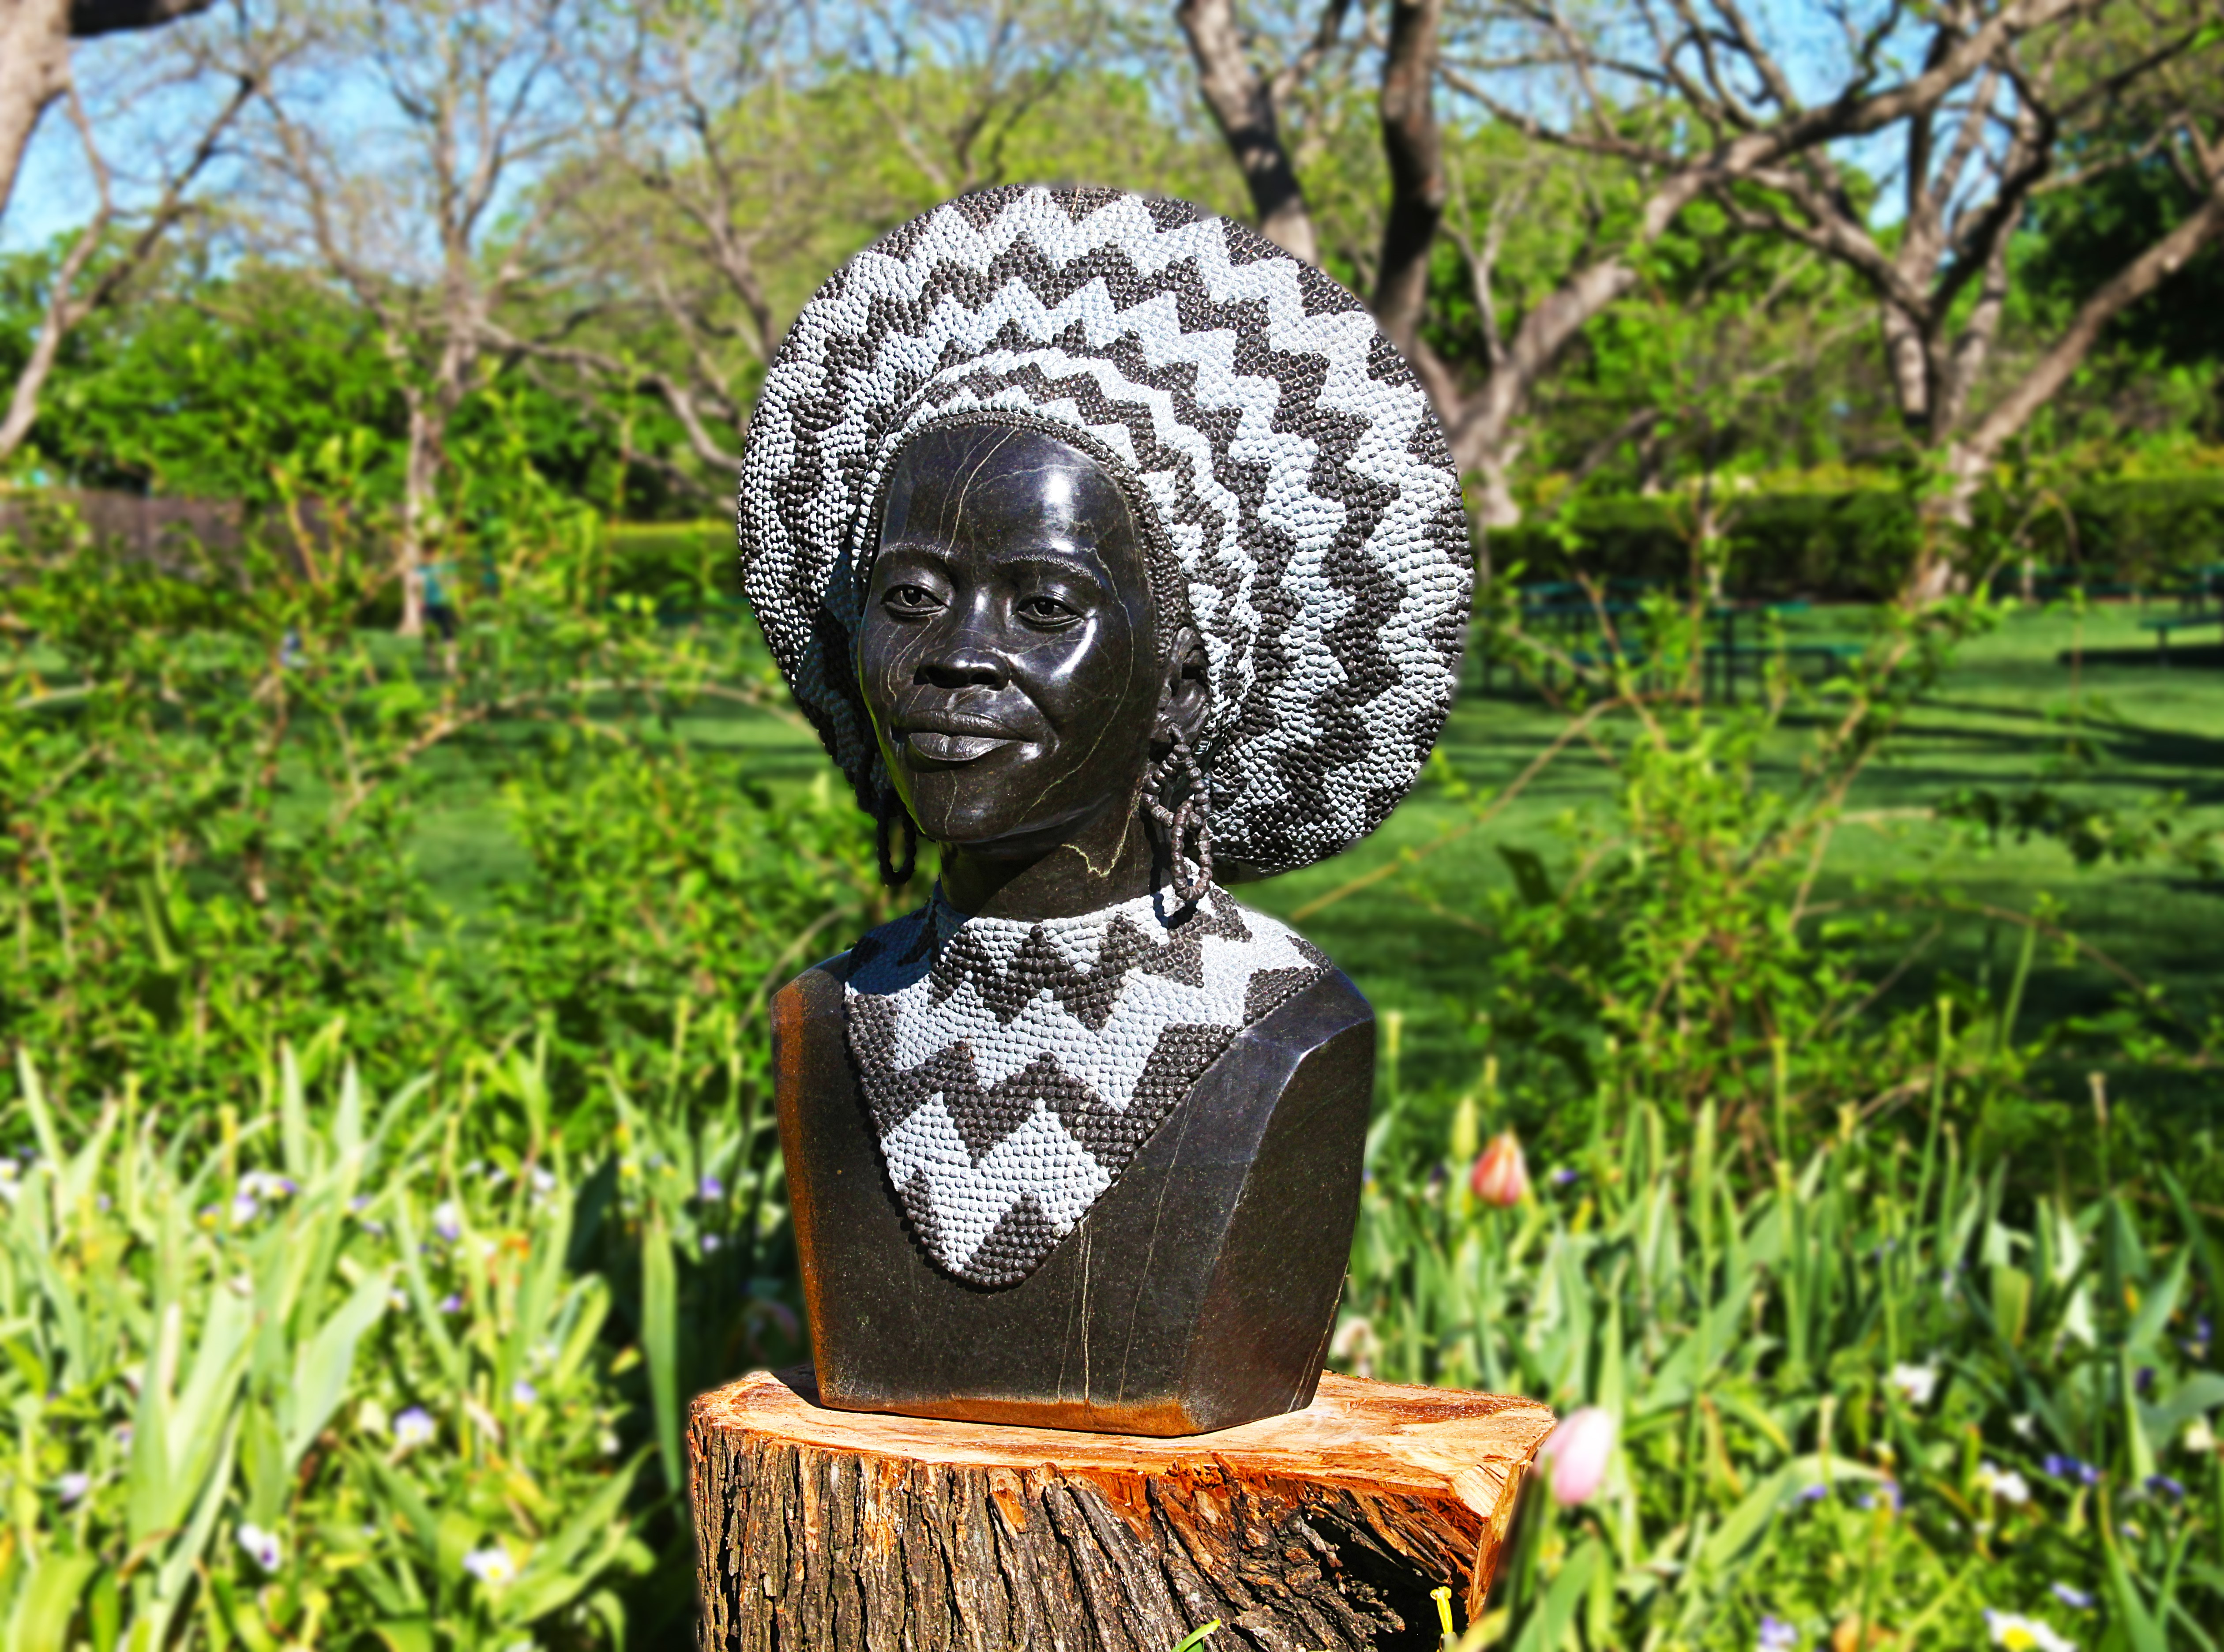 Dallas Arbo Zulu Queen, Tafadzwa Tandi